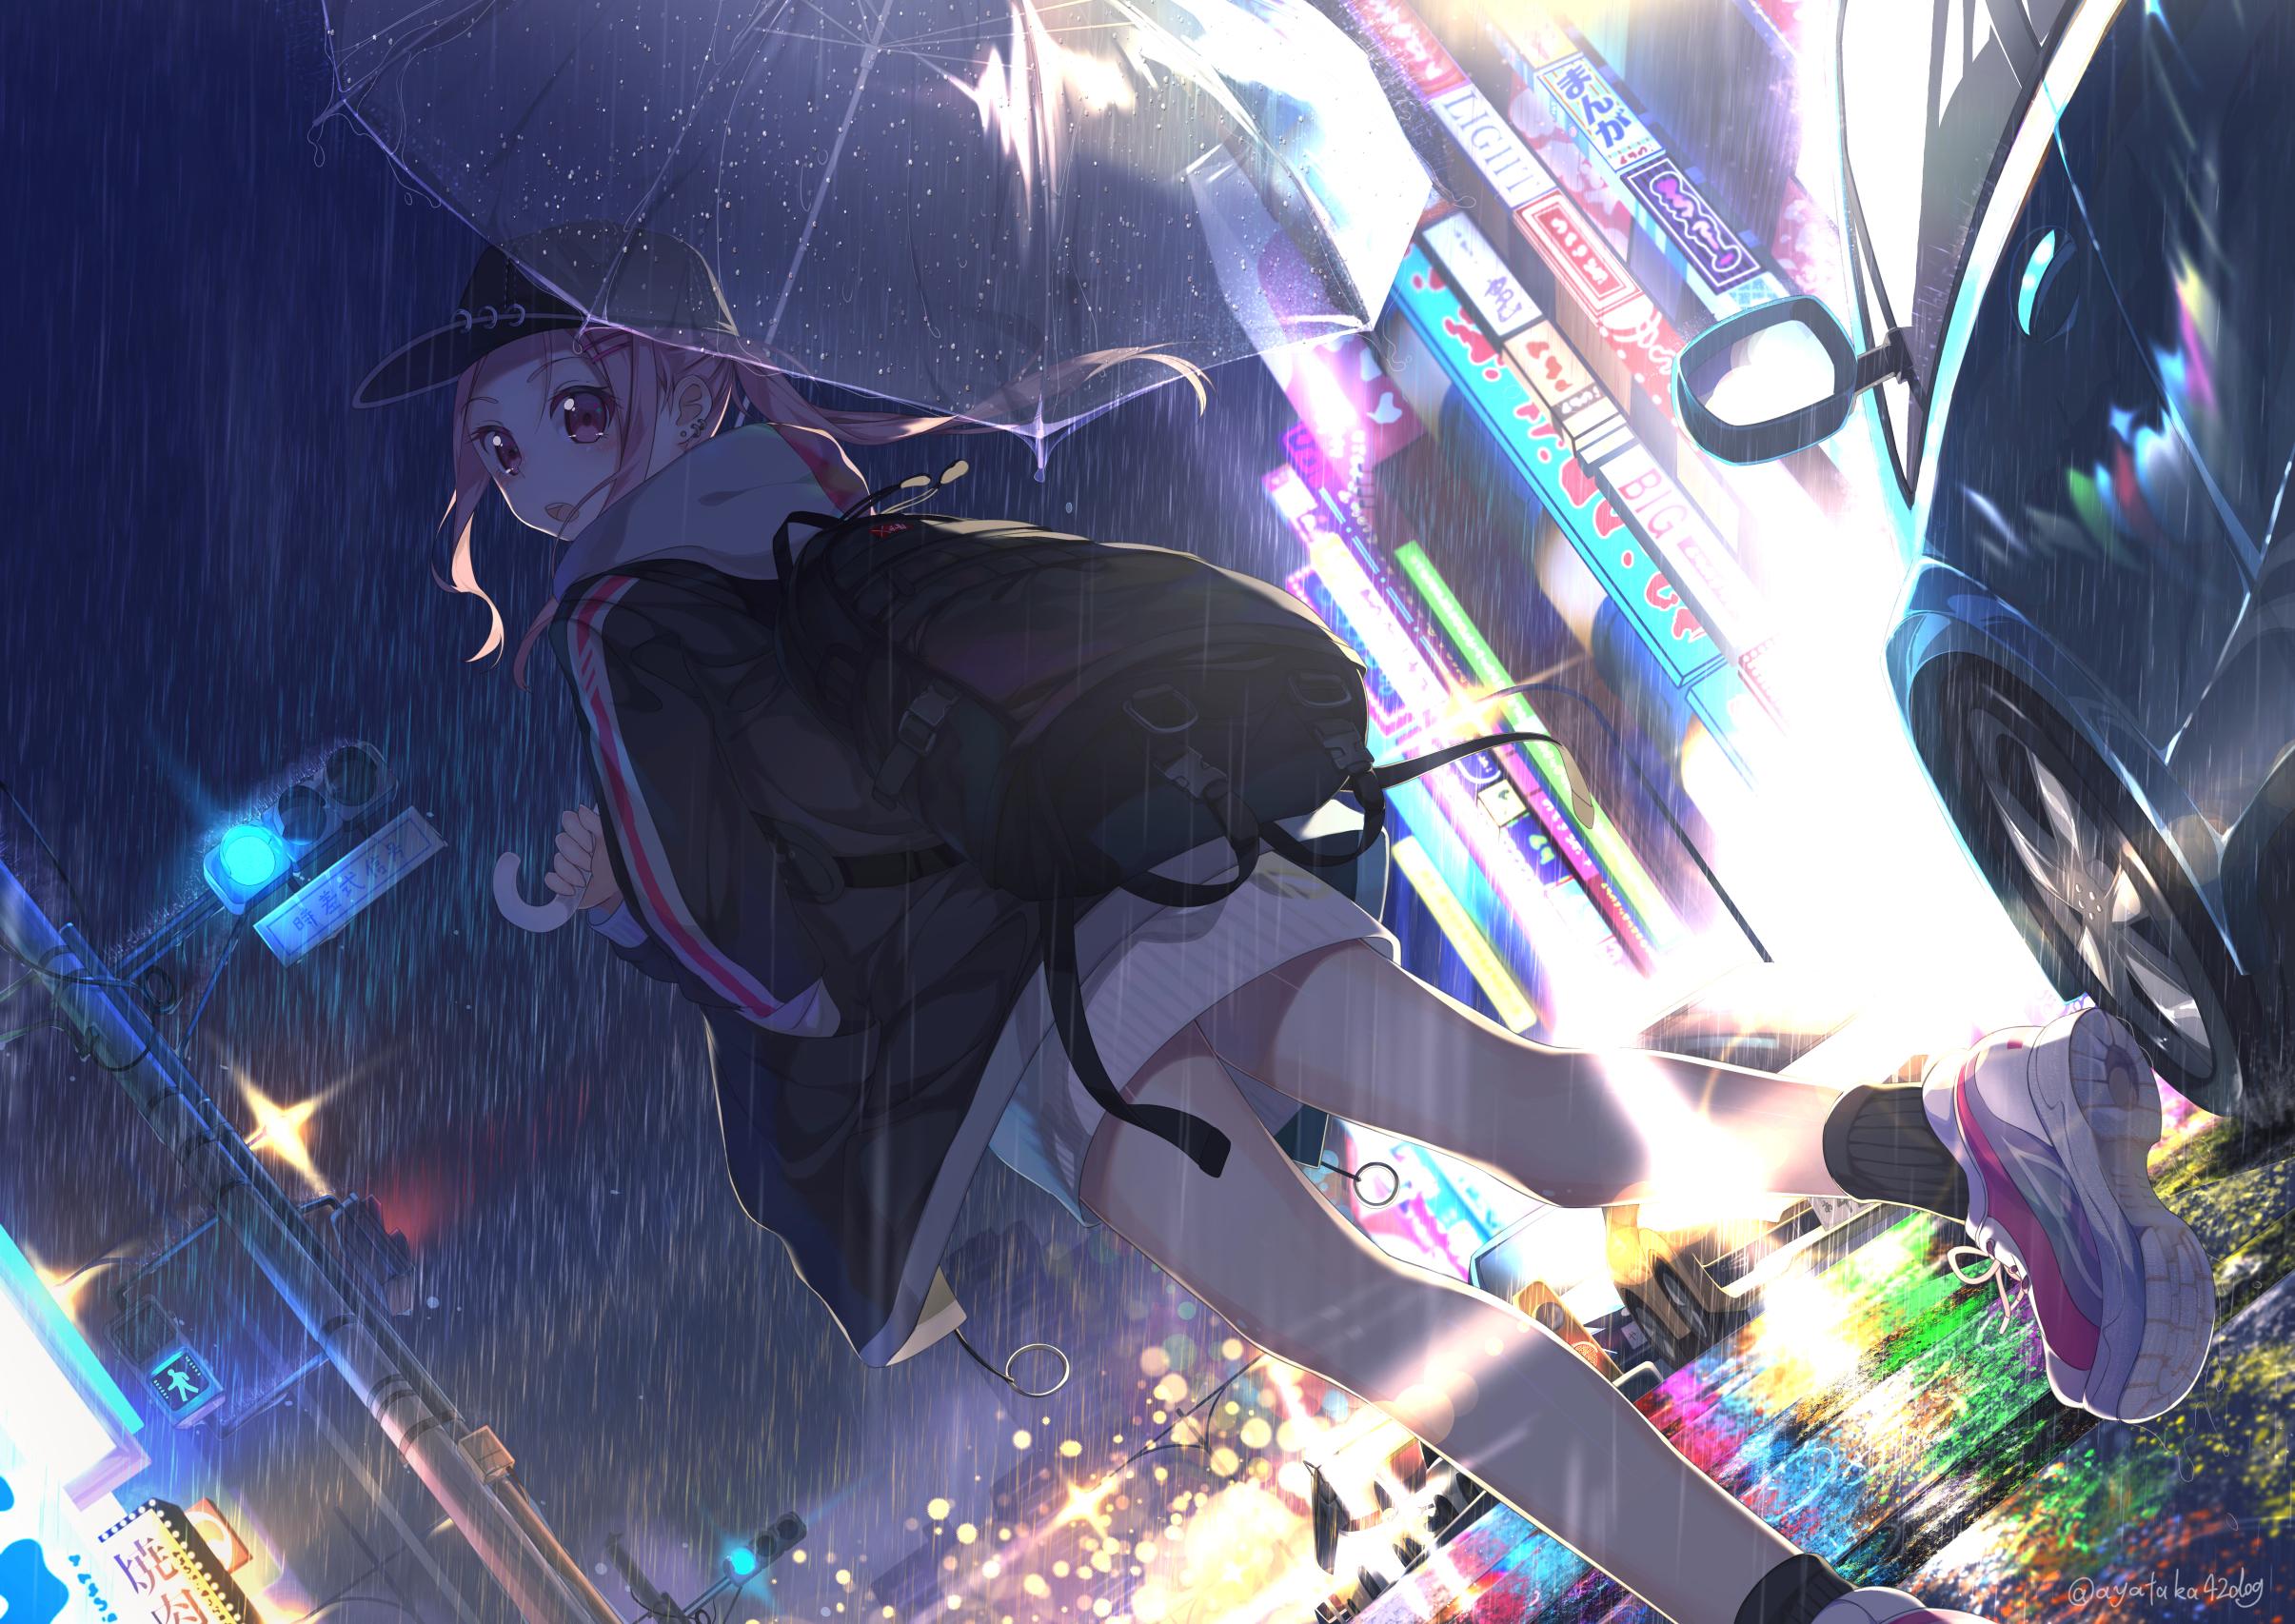 1920x1080 Anime Girl with Umbrella In Rain 1080P Laptop ...